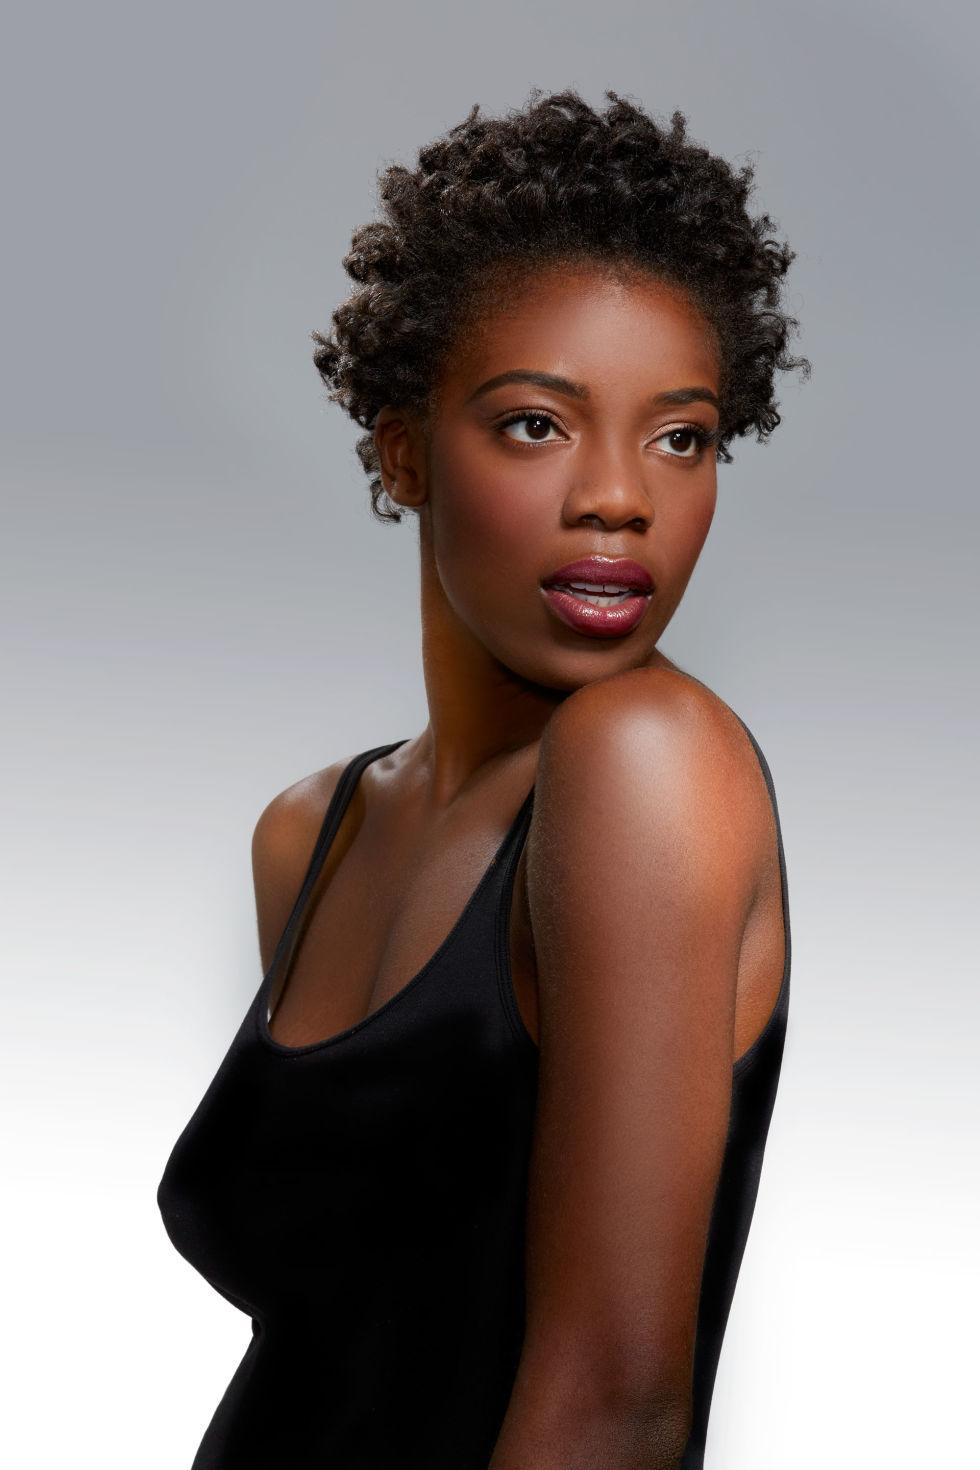 Super 29 Black Hairstyles Best African American Hairstyles Amp Haircuts Short Hairstyles For Black Women Fulllsitofus